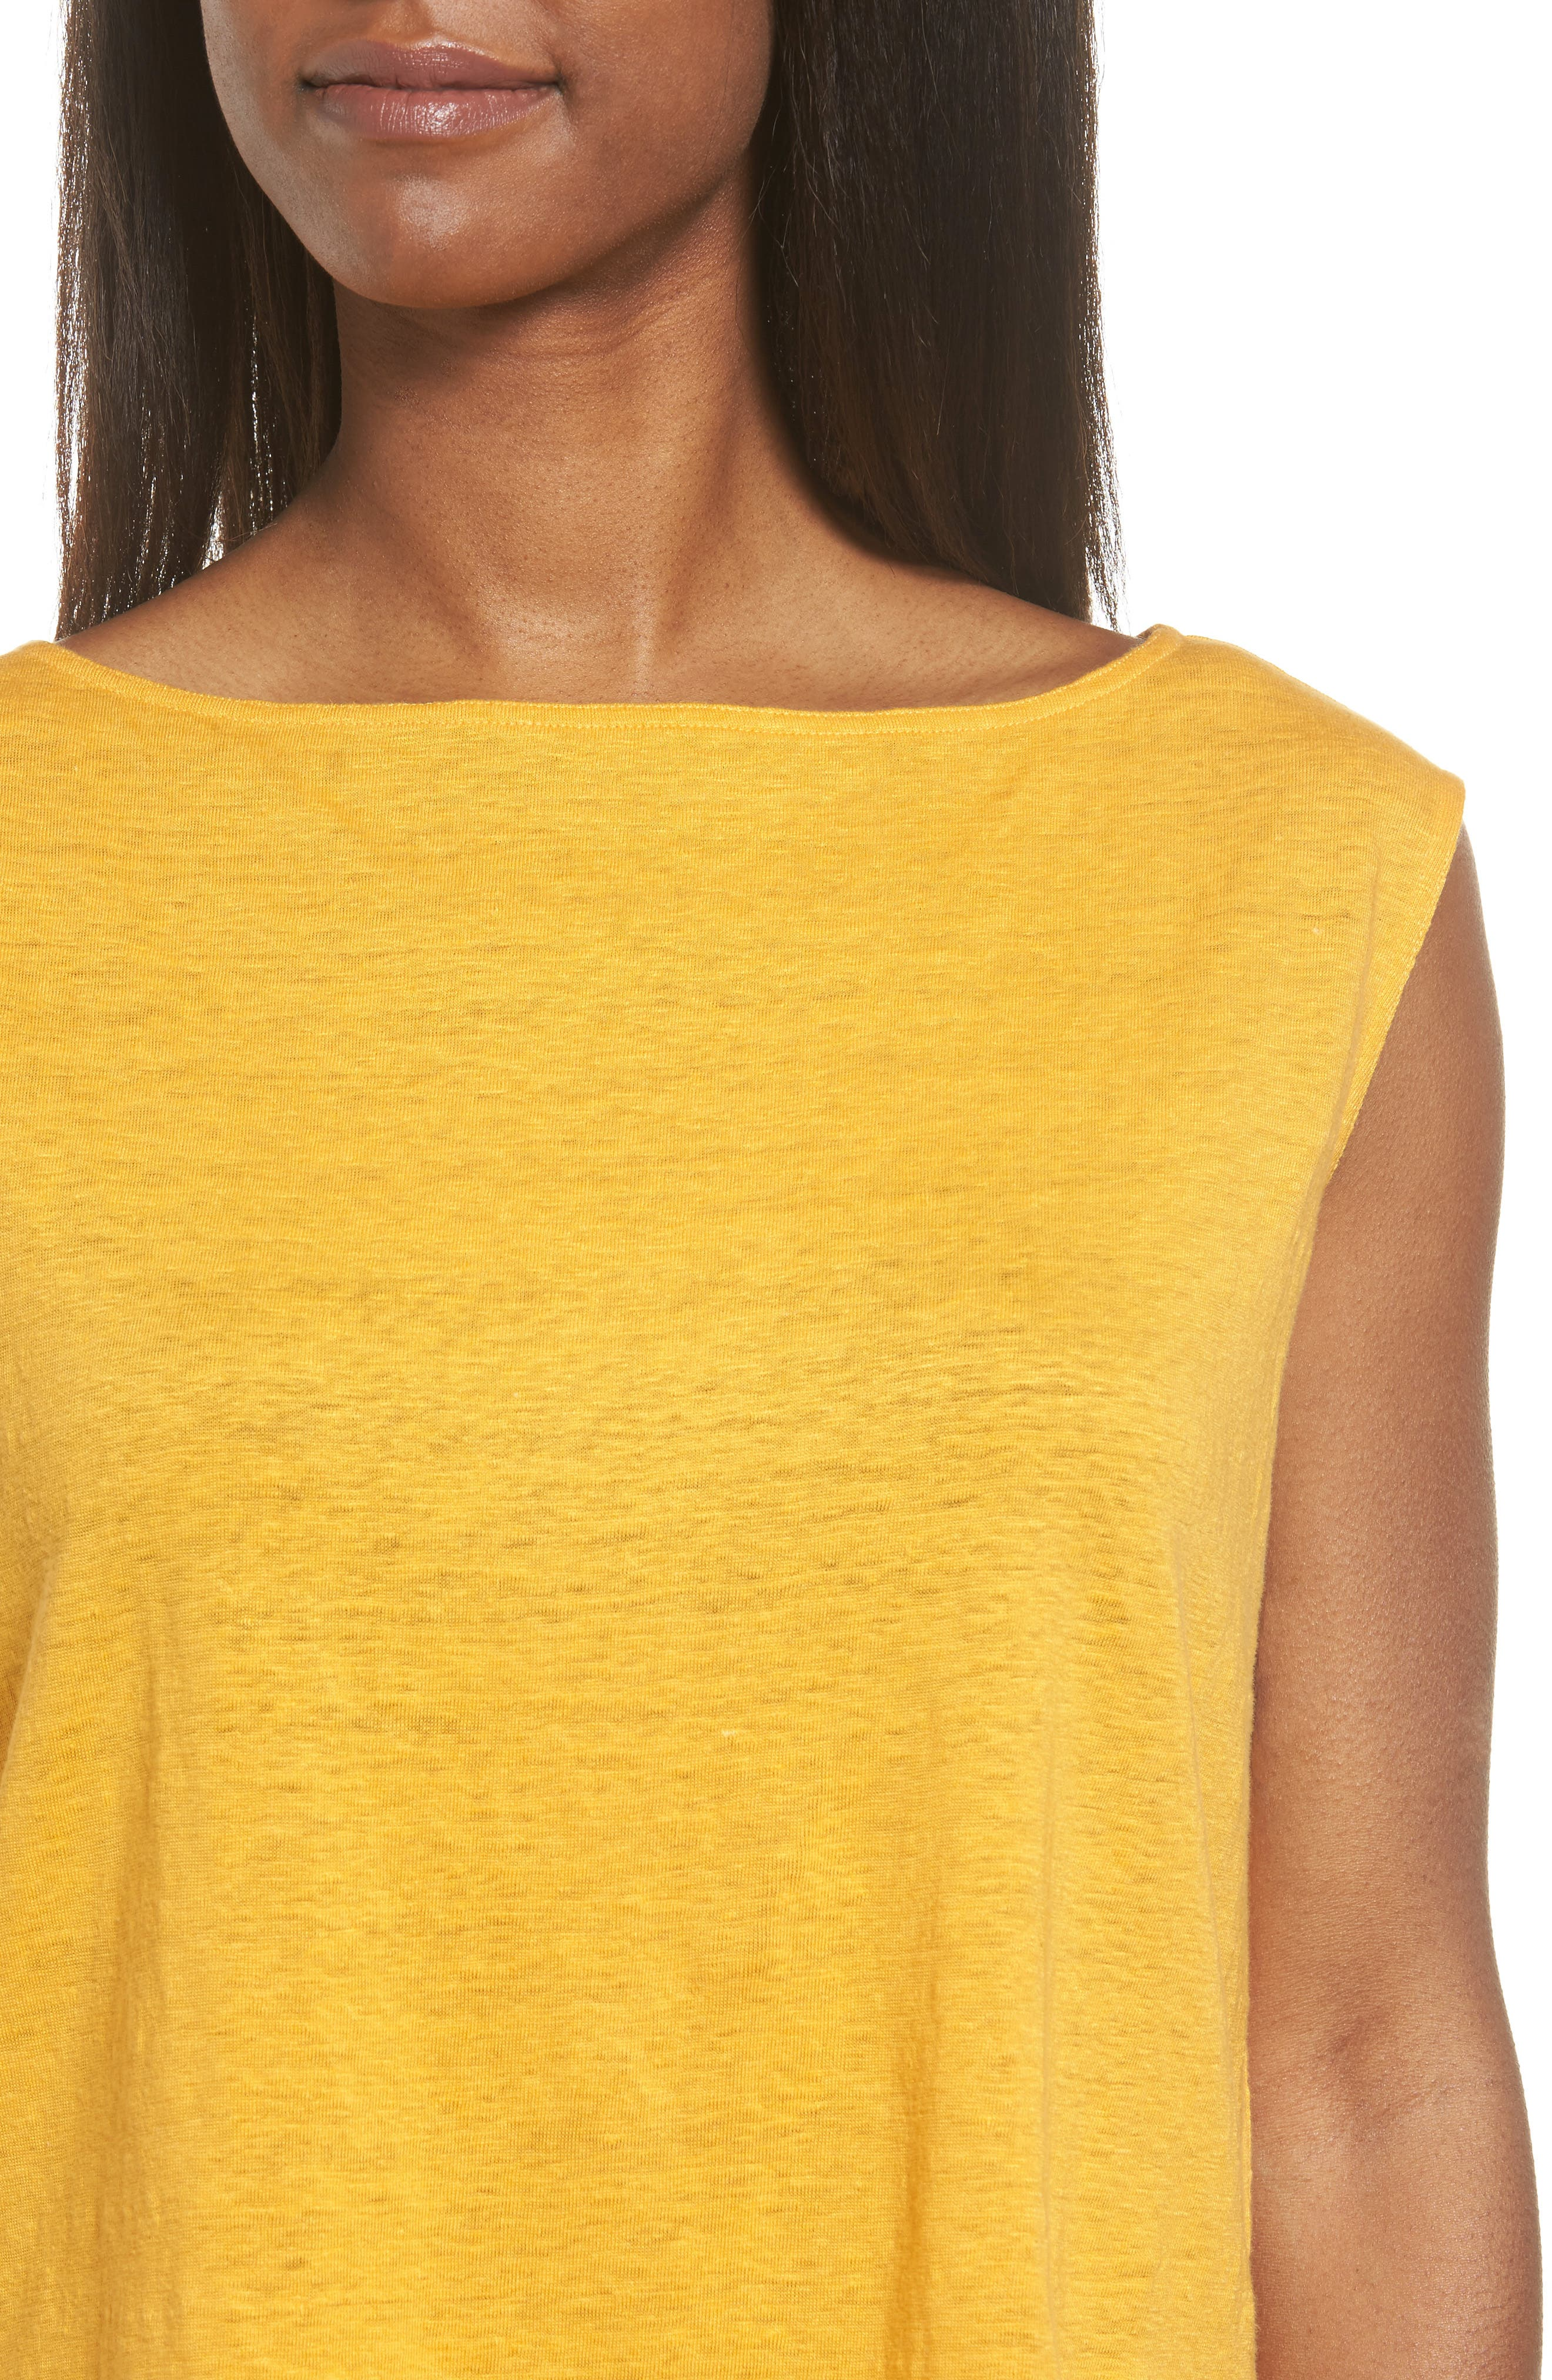 Organic Linen Top,                             Alternate thumbnail 4, color,                             Orangeade